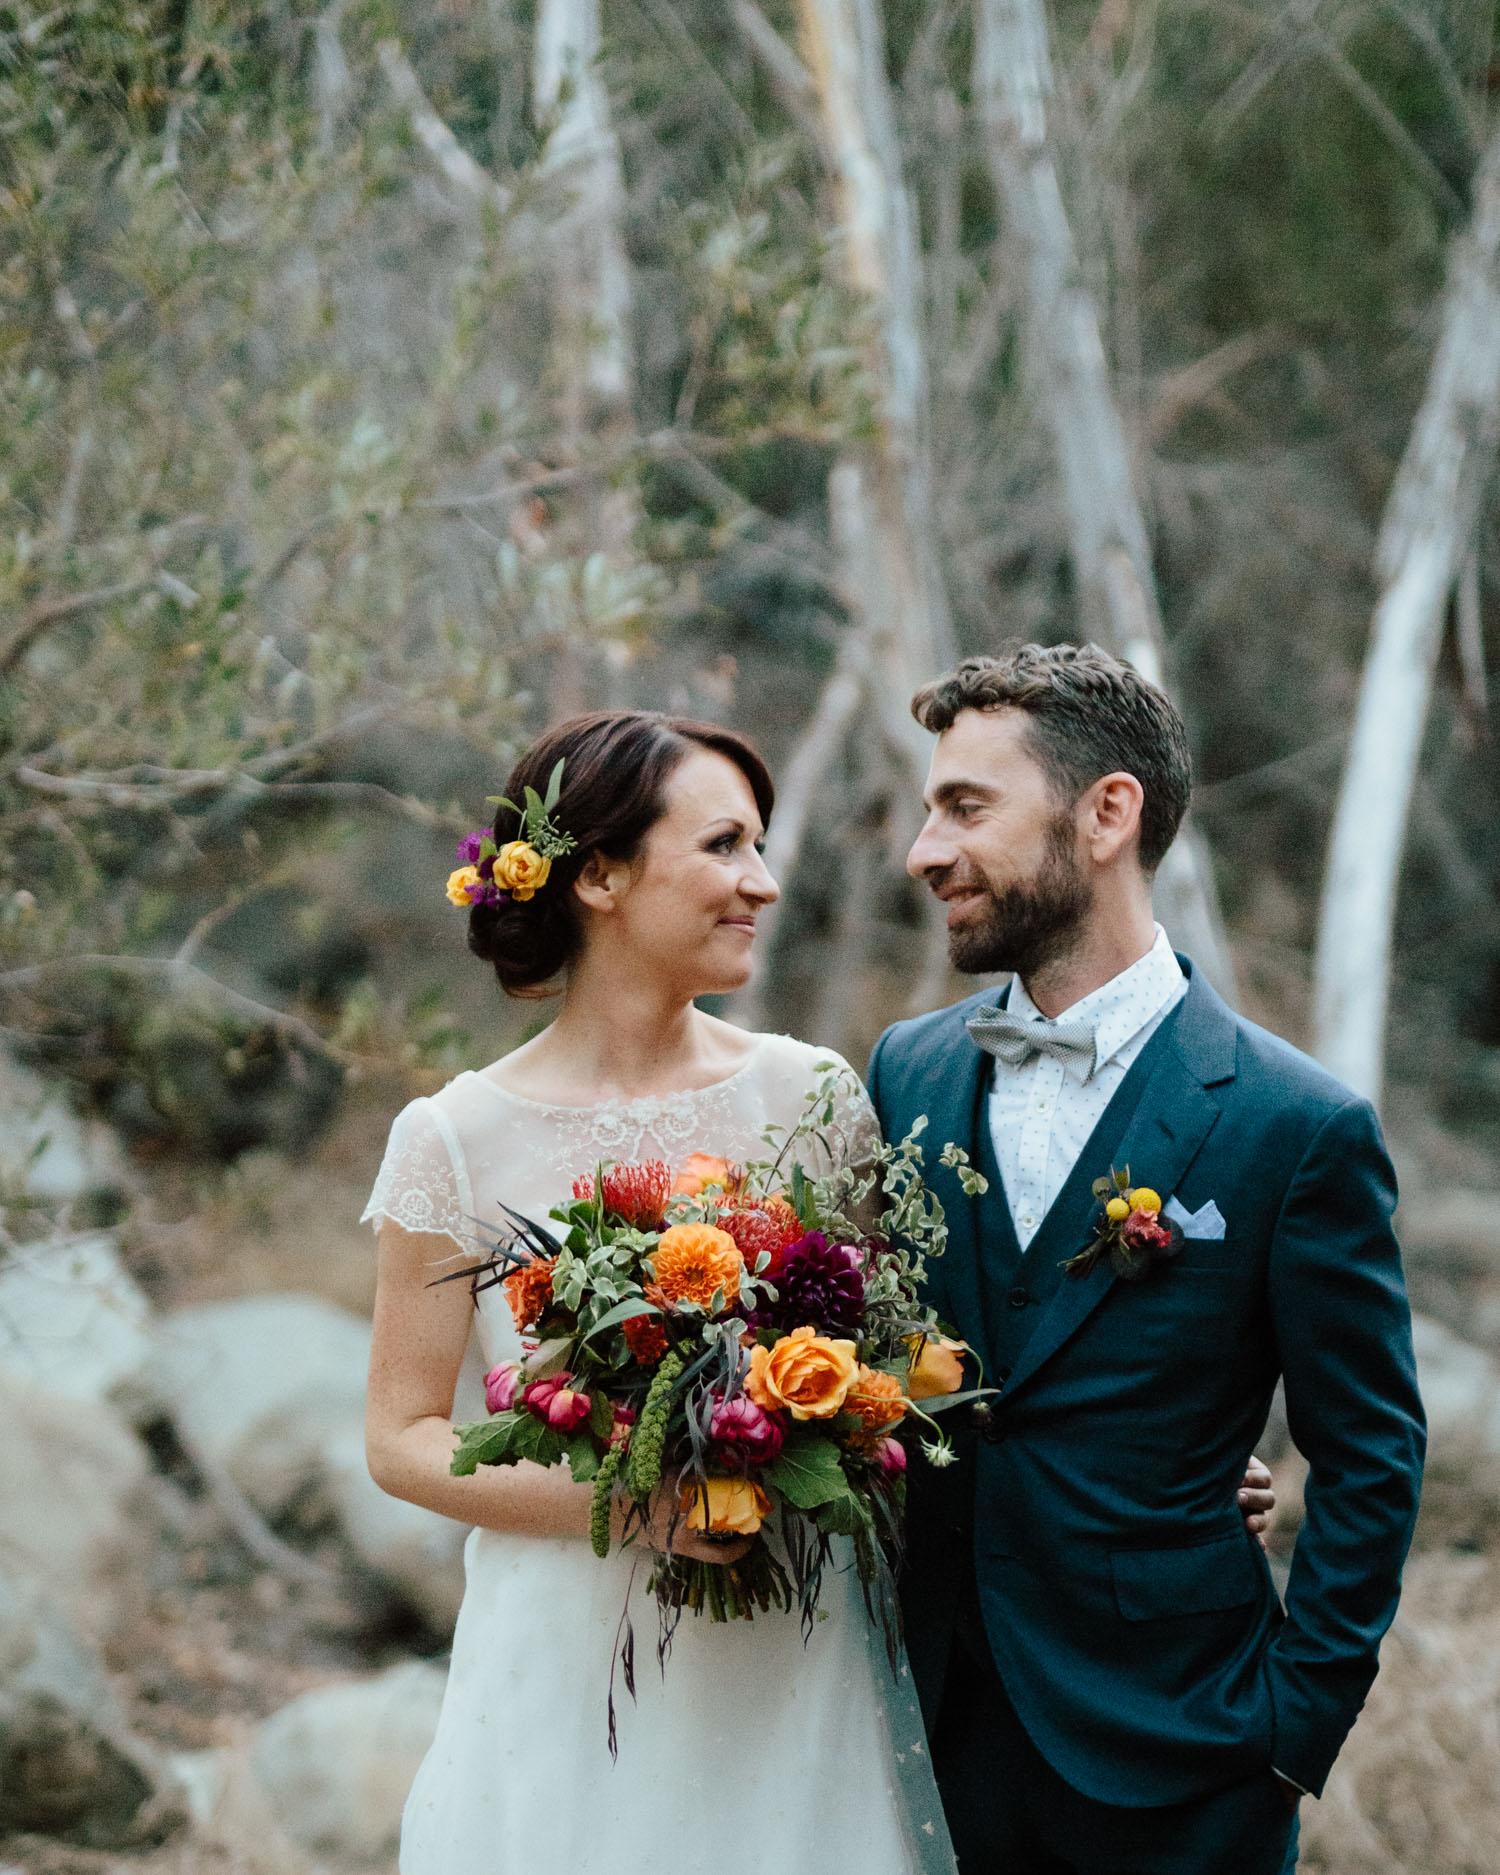 Ojai Wedding Photographer, Calliote Canyon Wedding - The Gathering Season x weareleoandkat 070.JPG